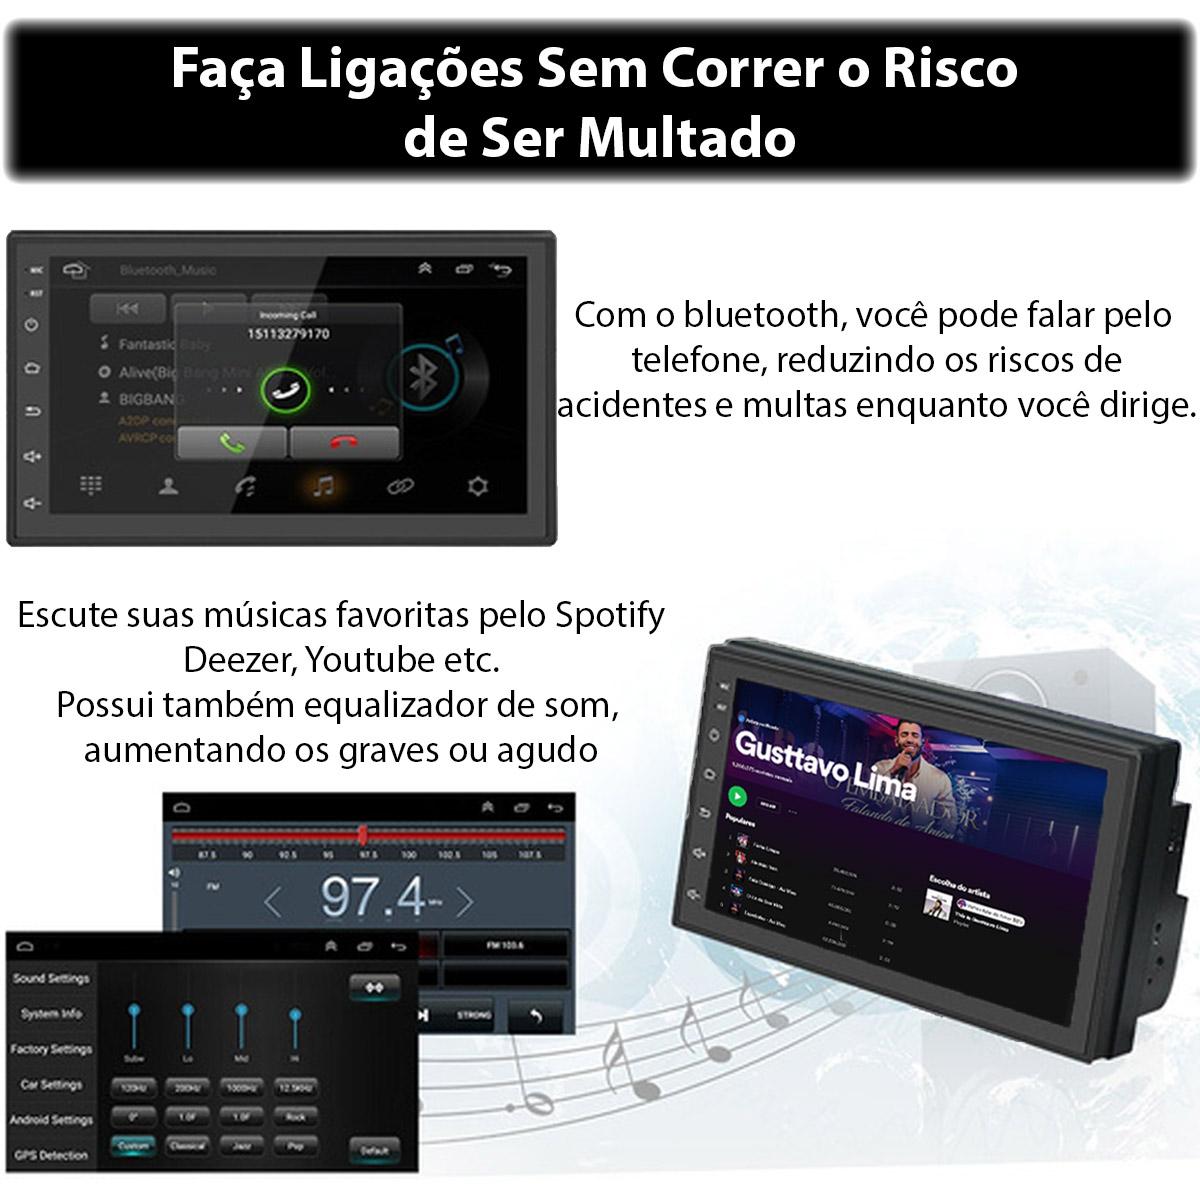 Central Multimidia com Moldura Fiat Toro Mp5 Bluetooth Usb Touchscreen 7 Polegadas 2 Din Black Piano Poliparts